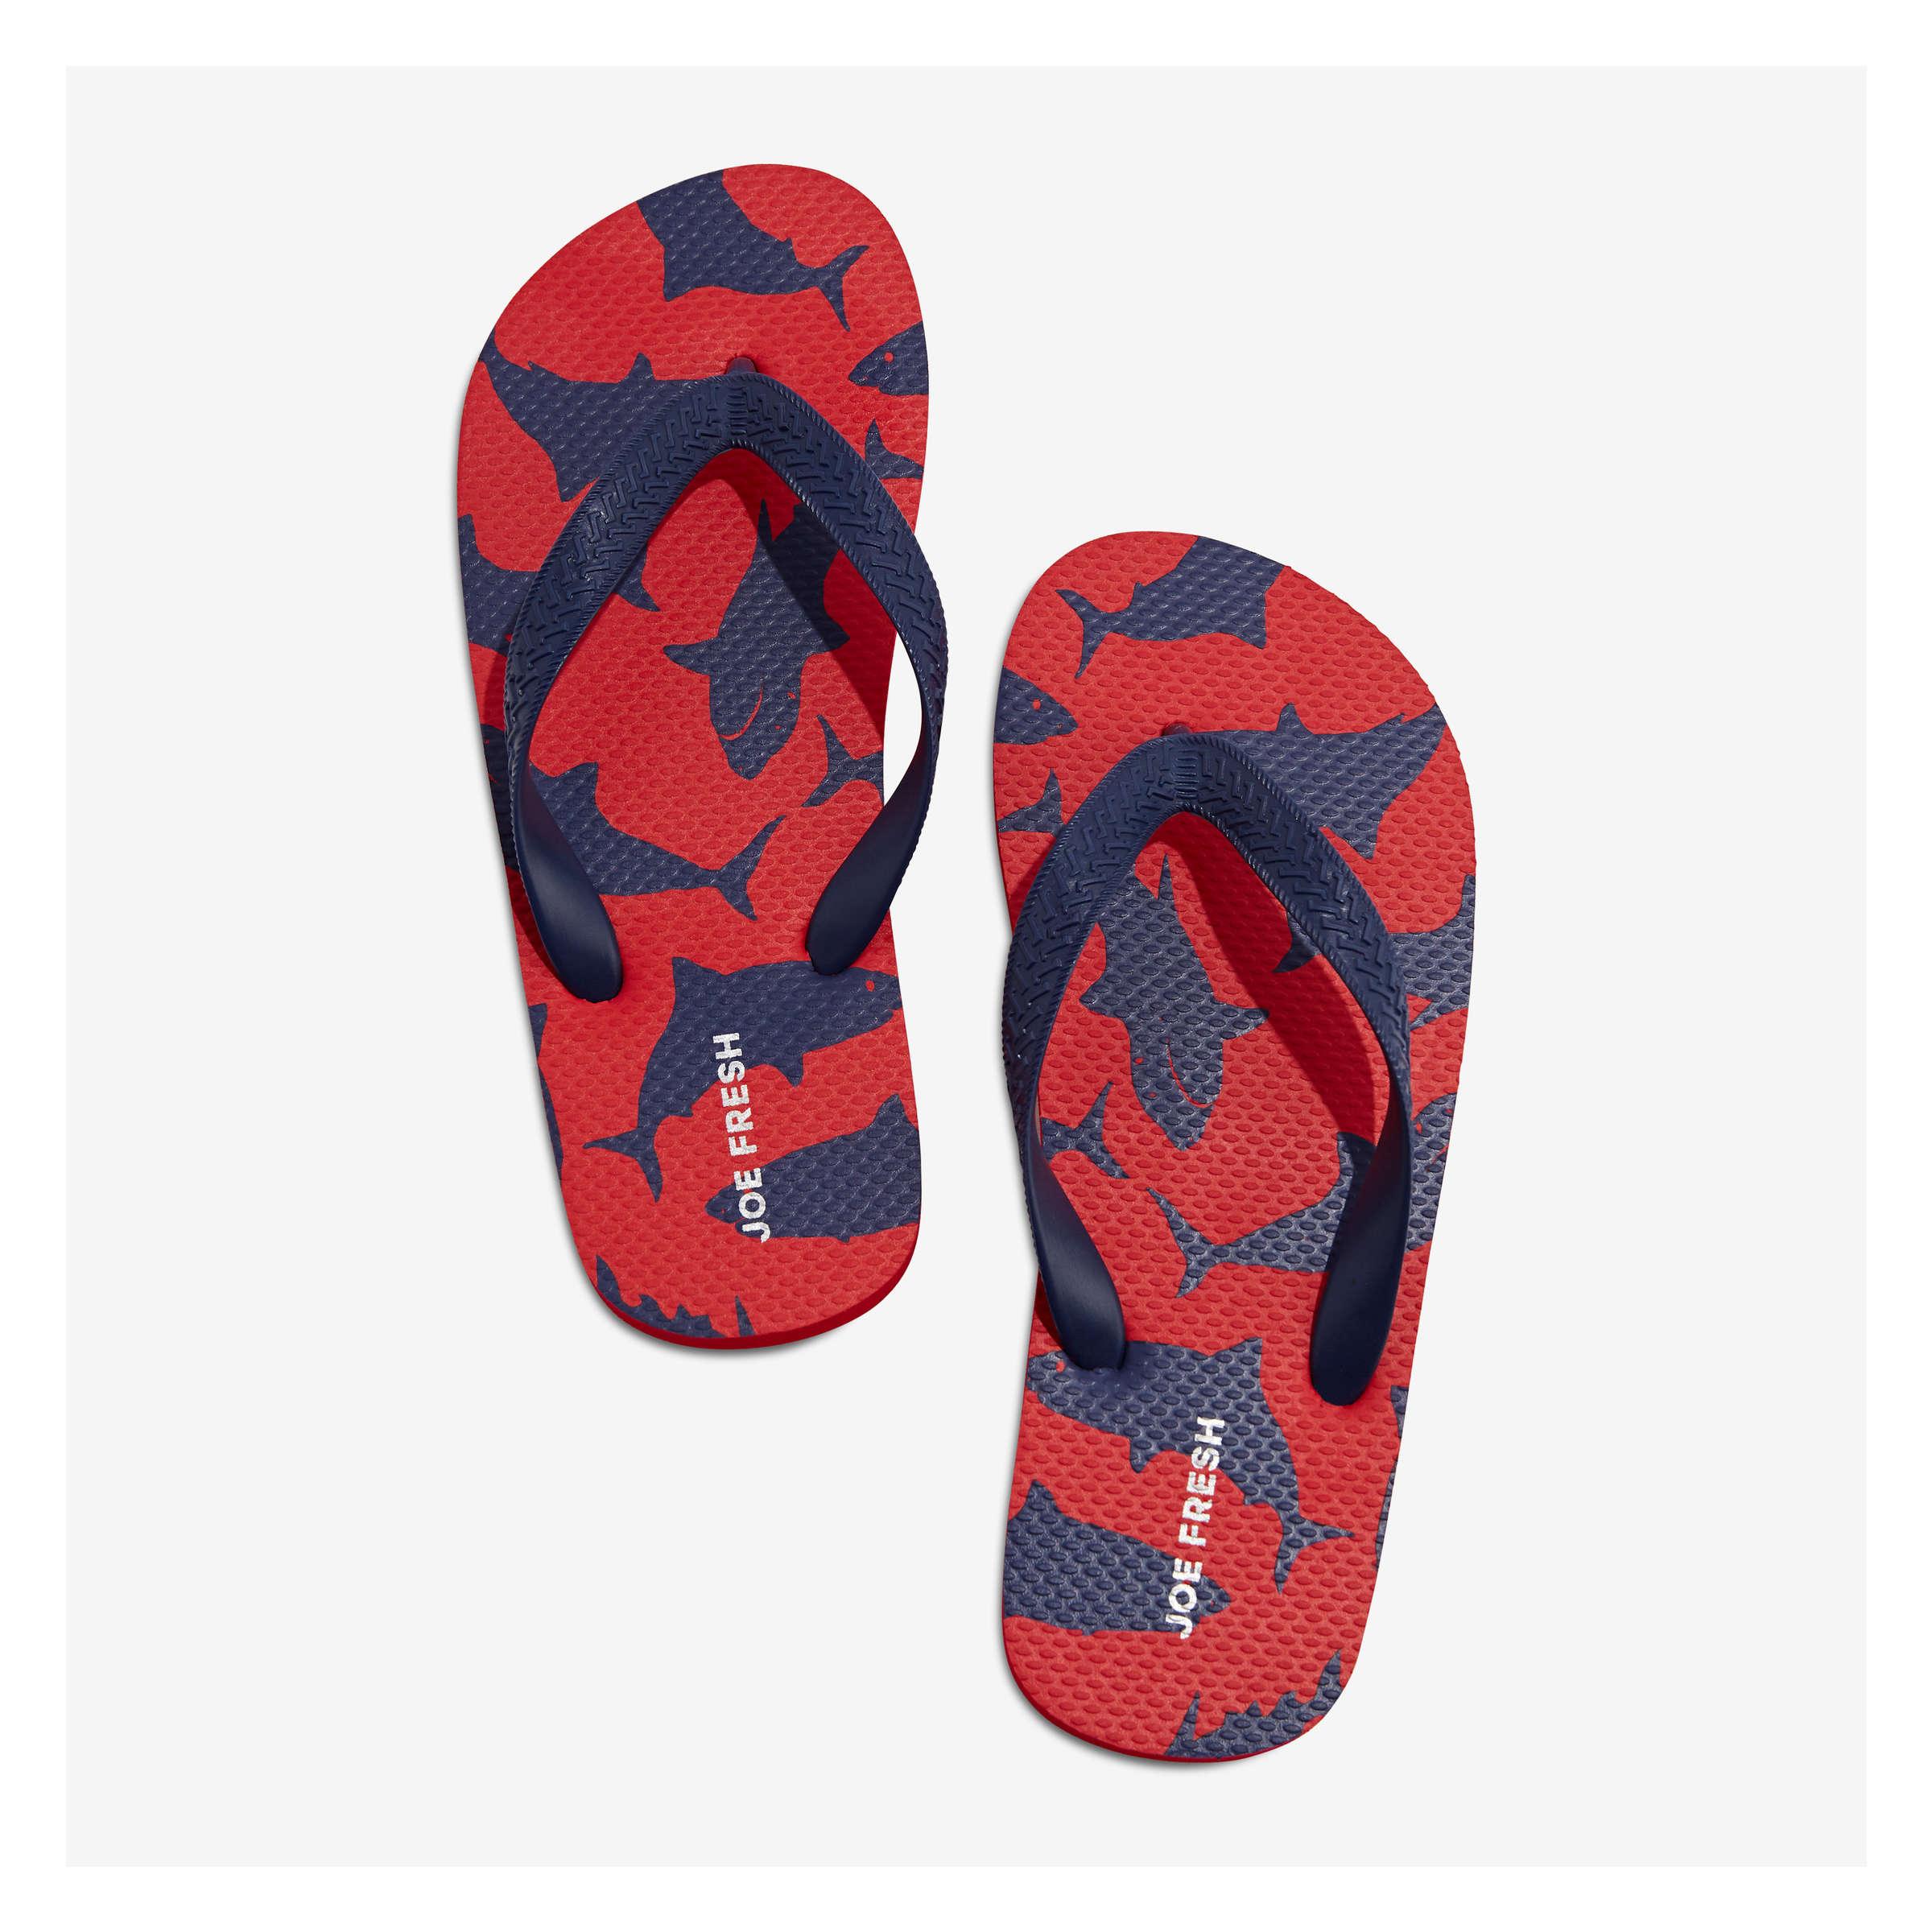 09097ac38 Kid Boys  Flip Flops in Red from Joe Fresh